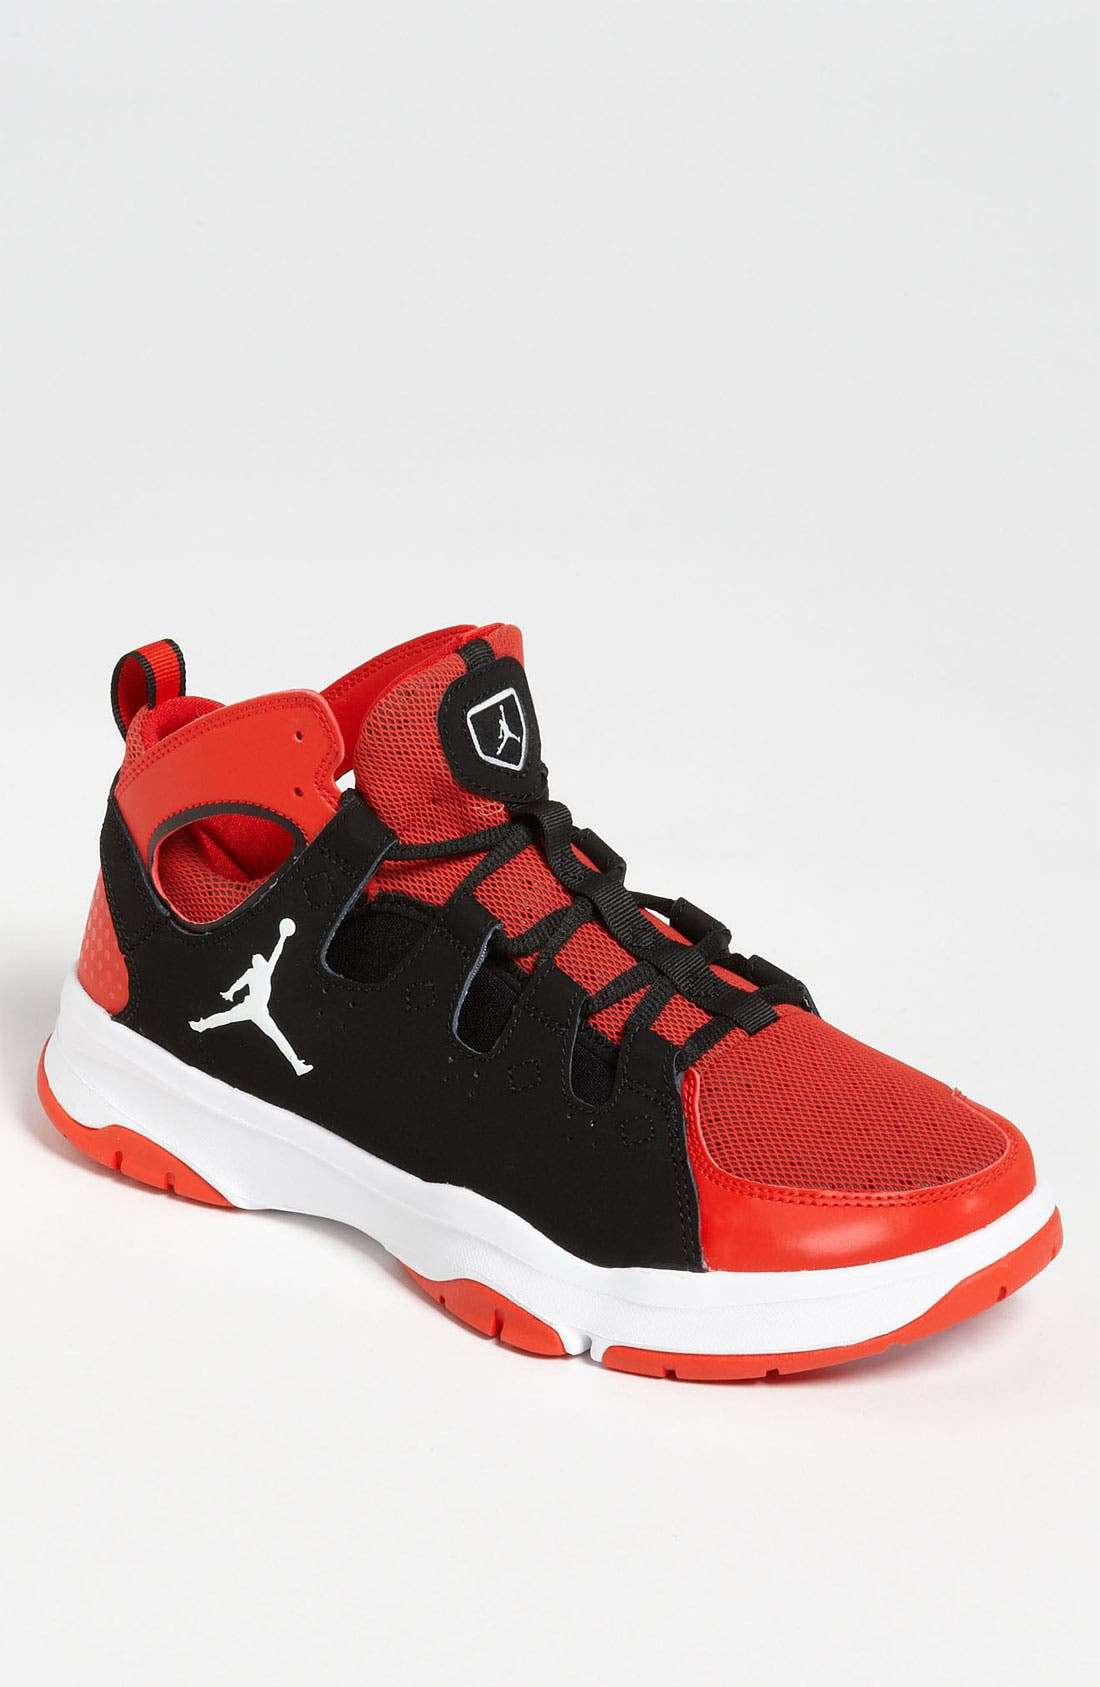 Alternate Image 1 Selected - Nike 'Jordan Legend TR' Basketball Shoe (Men)